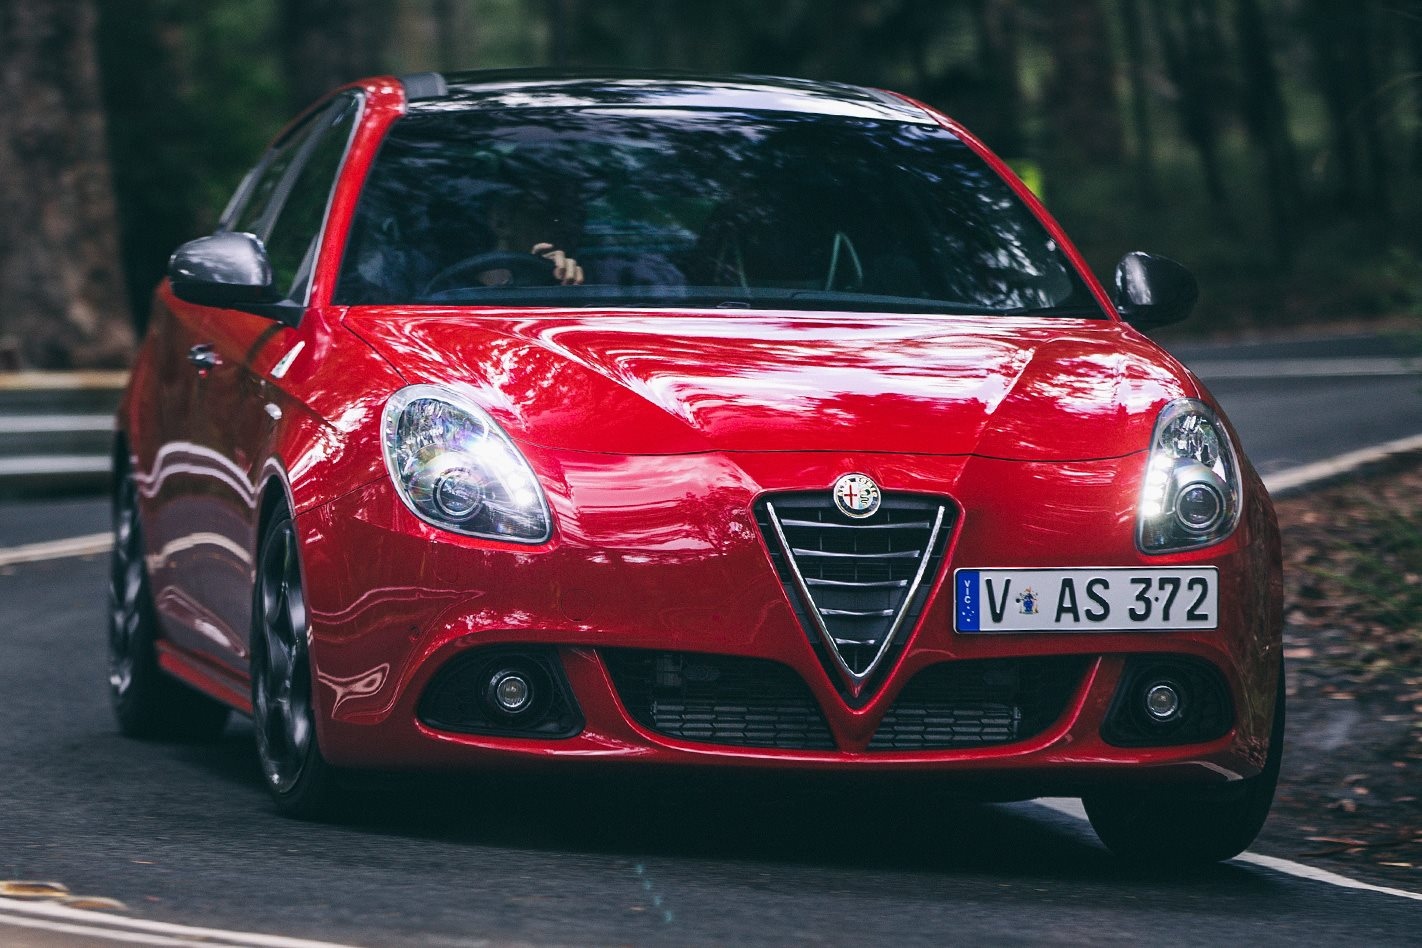 Leichhardt Fiat Abarth Alfa Romeo  New Demo and Used